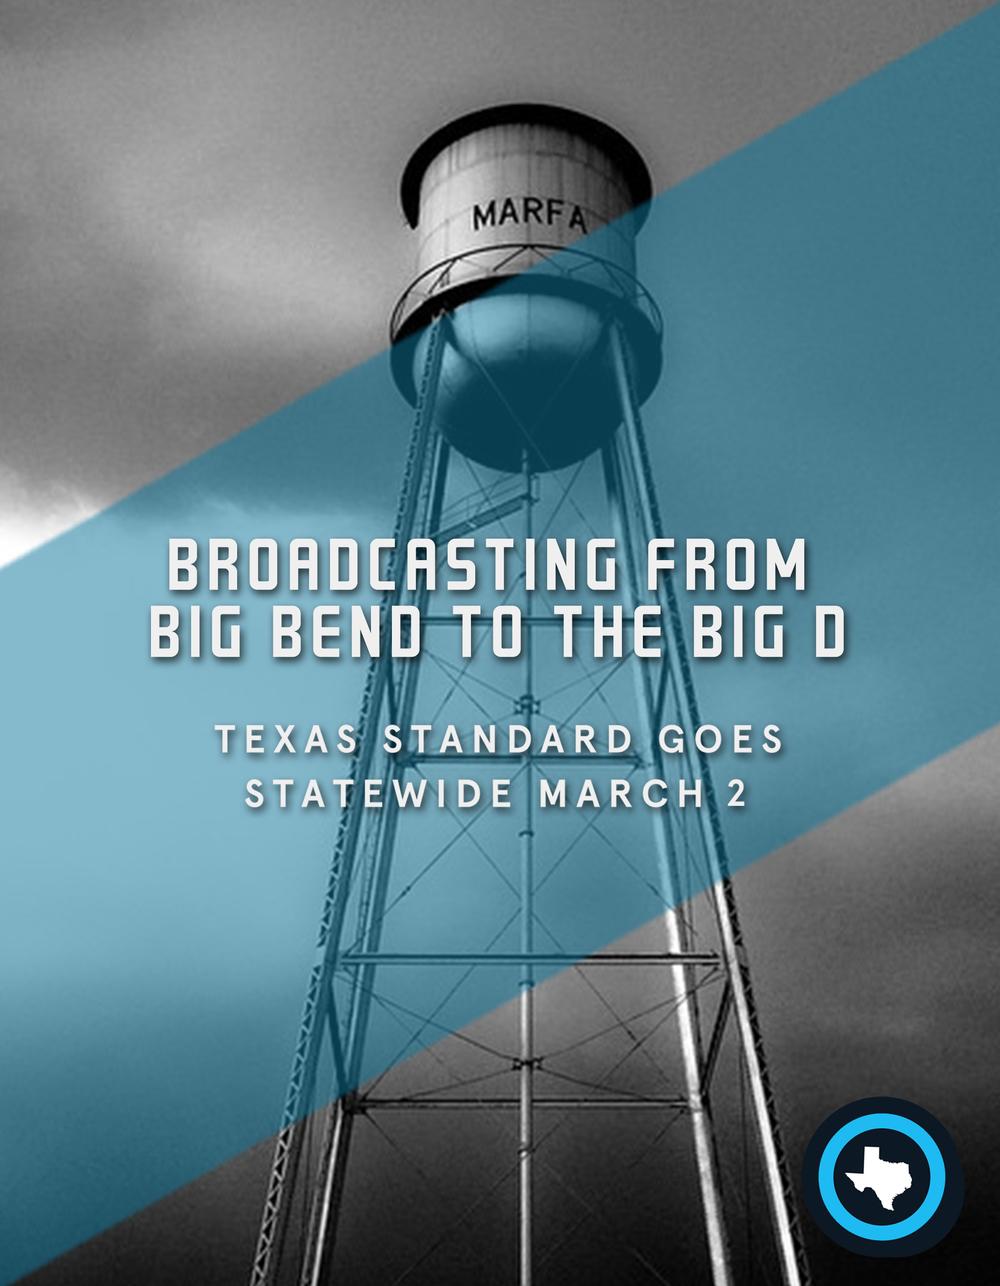 TexasStandard_findyourstation_Marfa_Prep.jpg